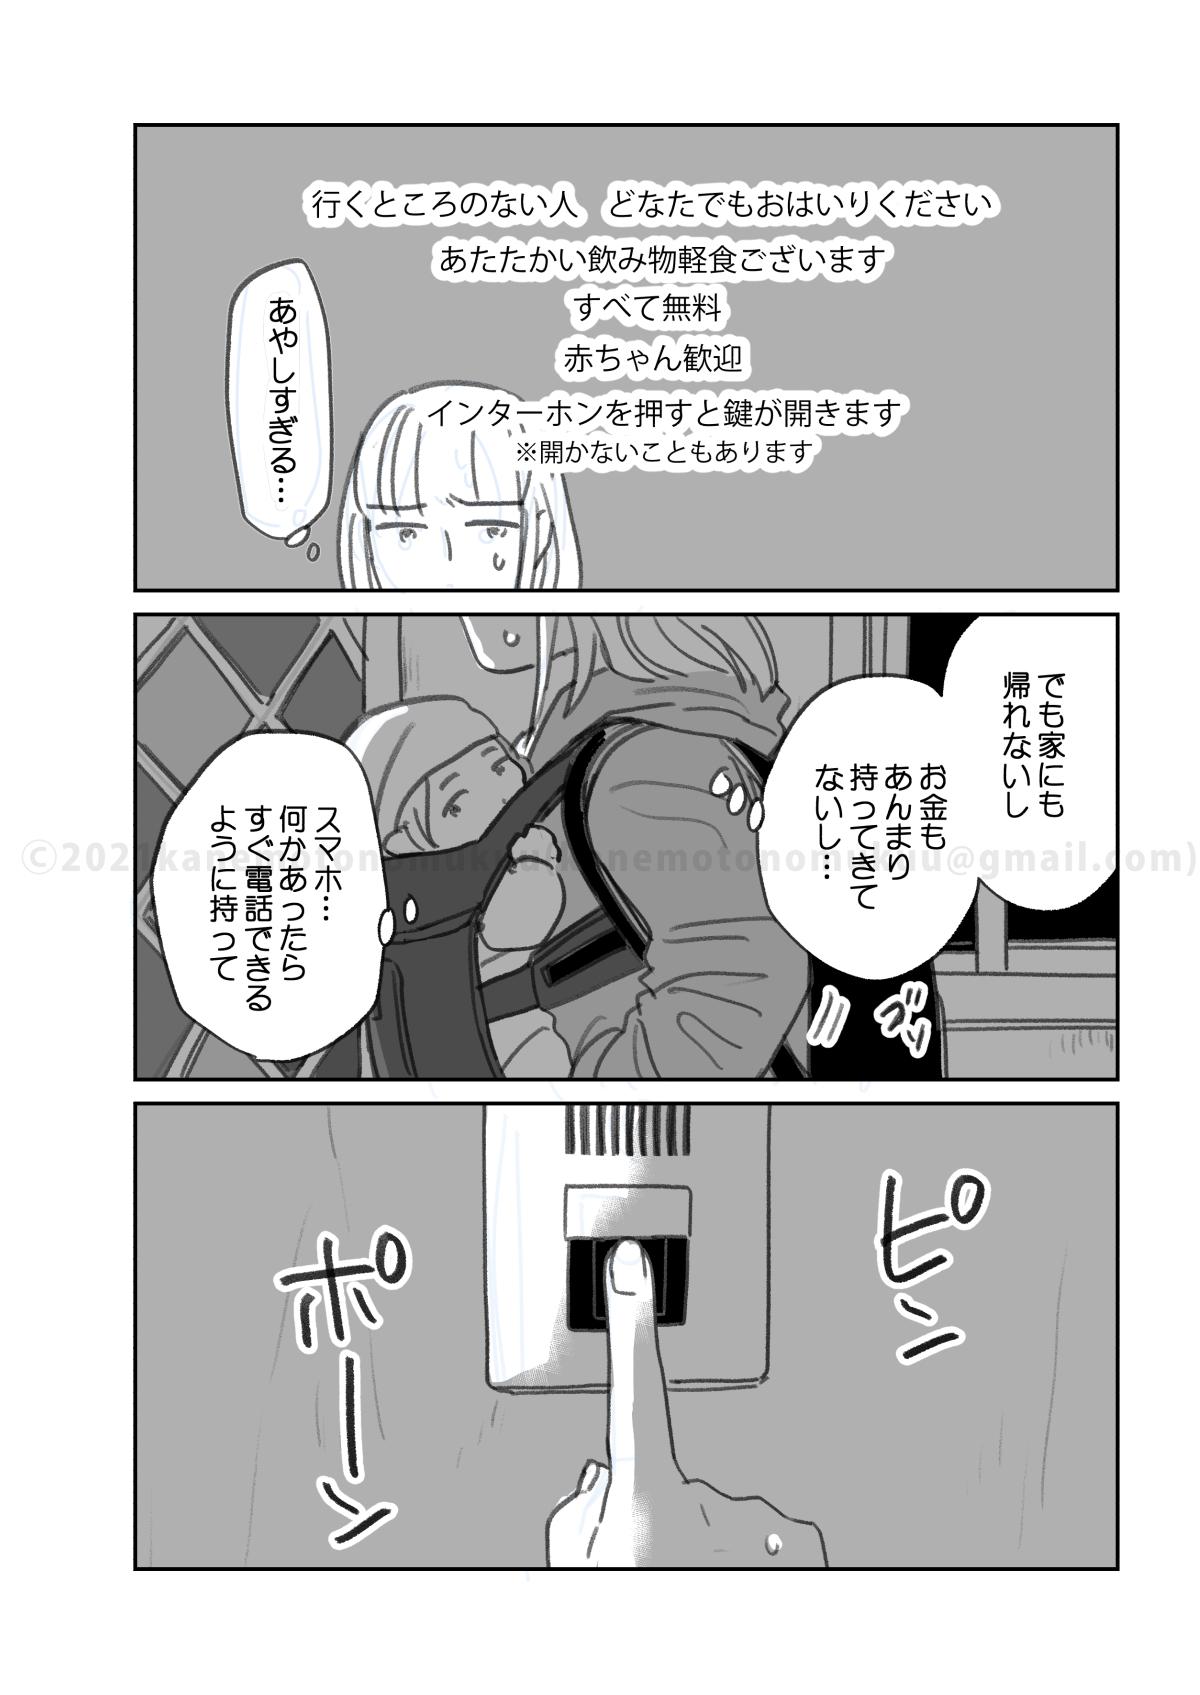 f:id:kanemotonomukuu:20210319175022j:plain